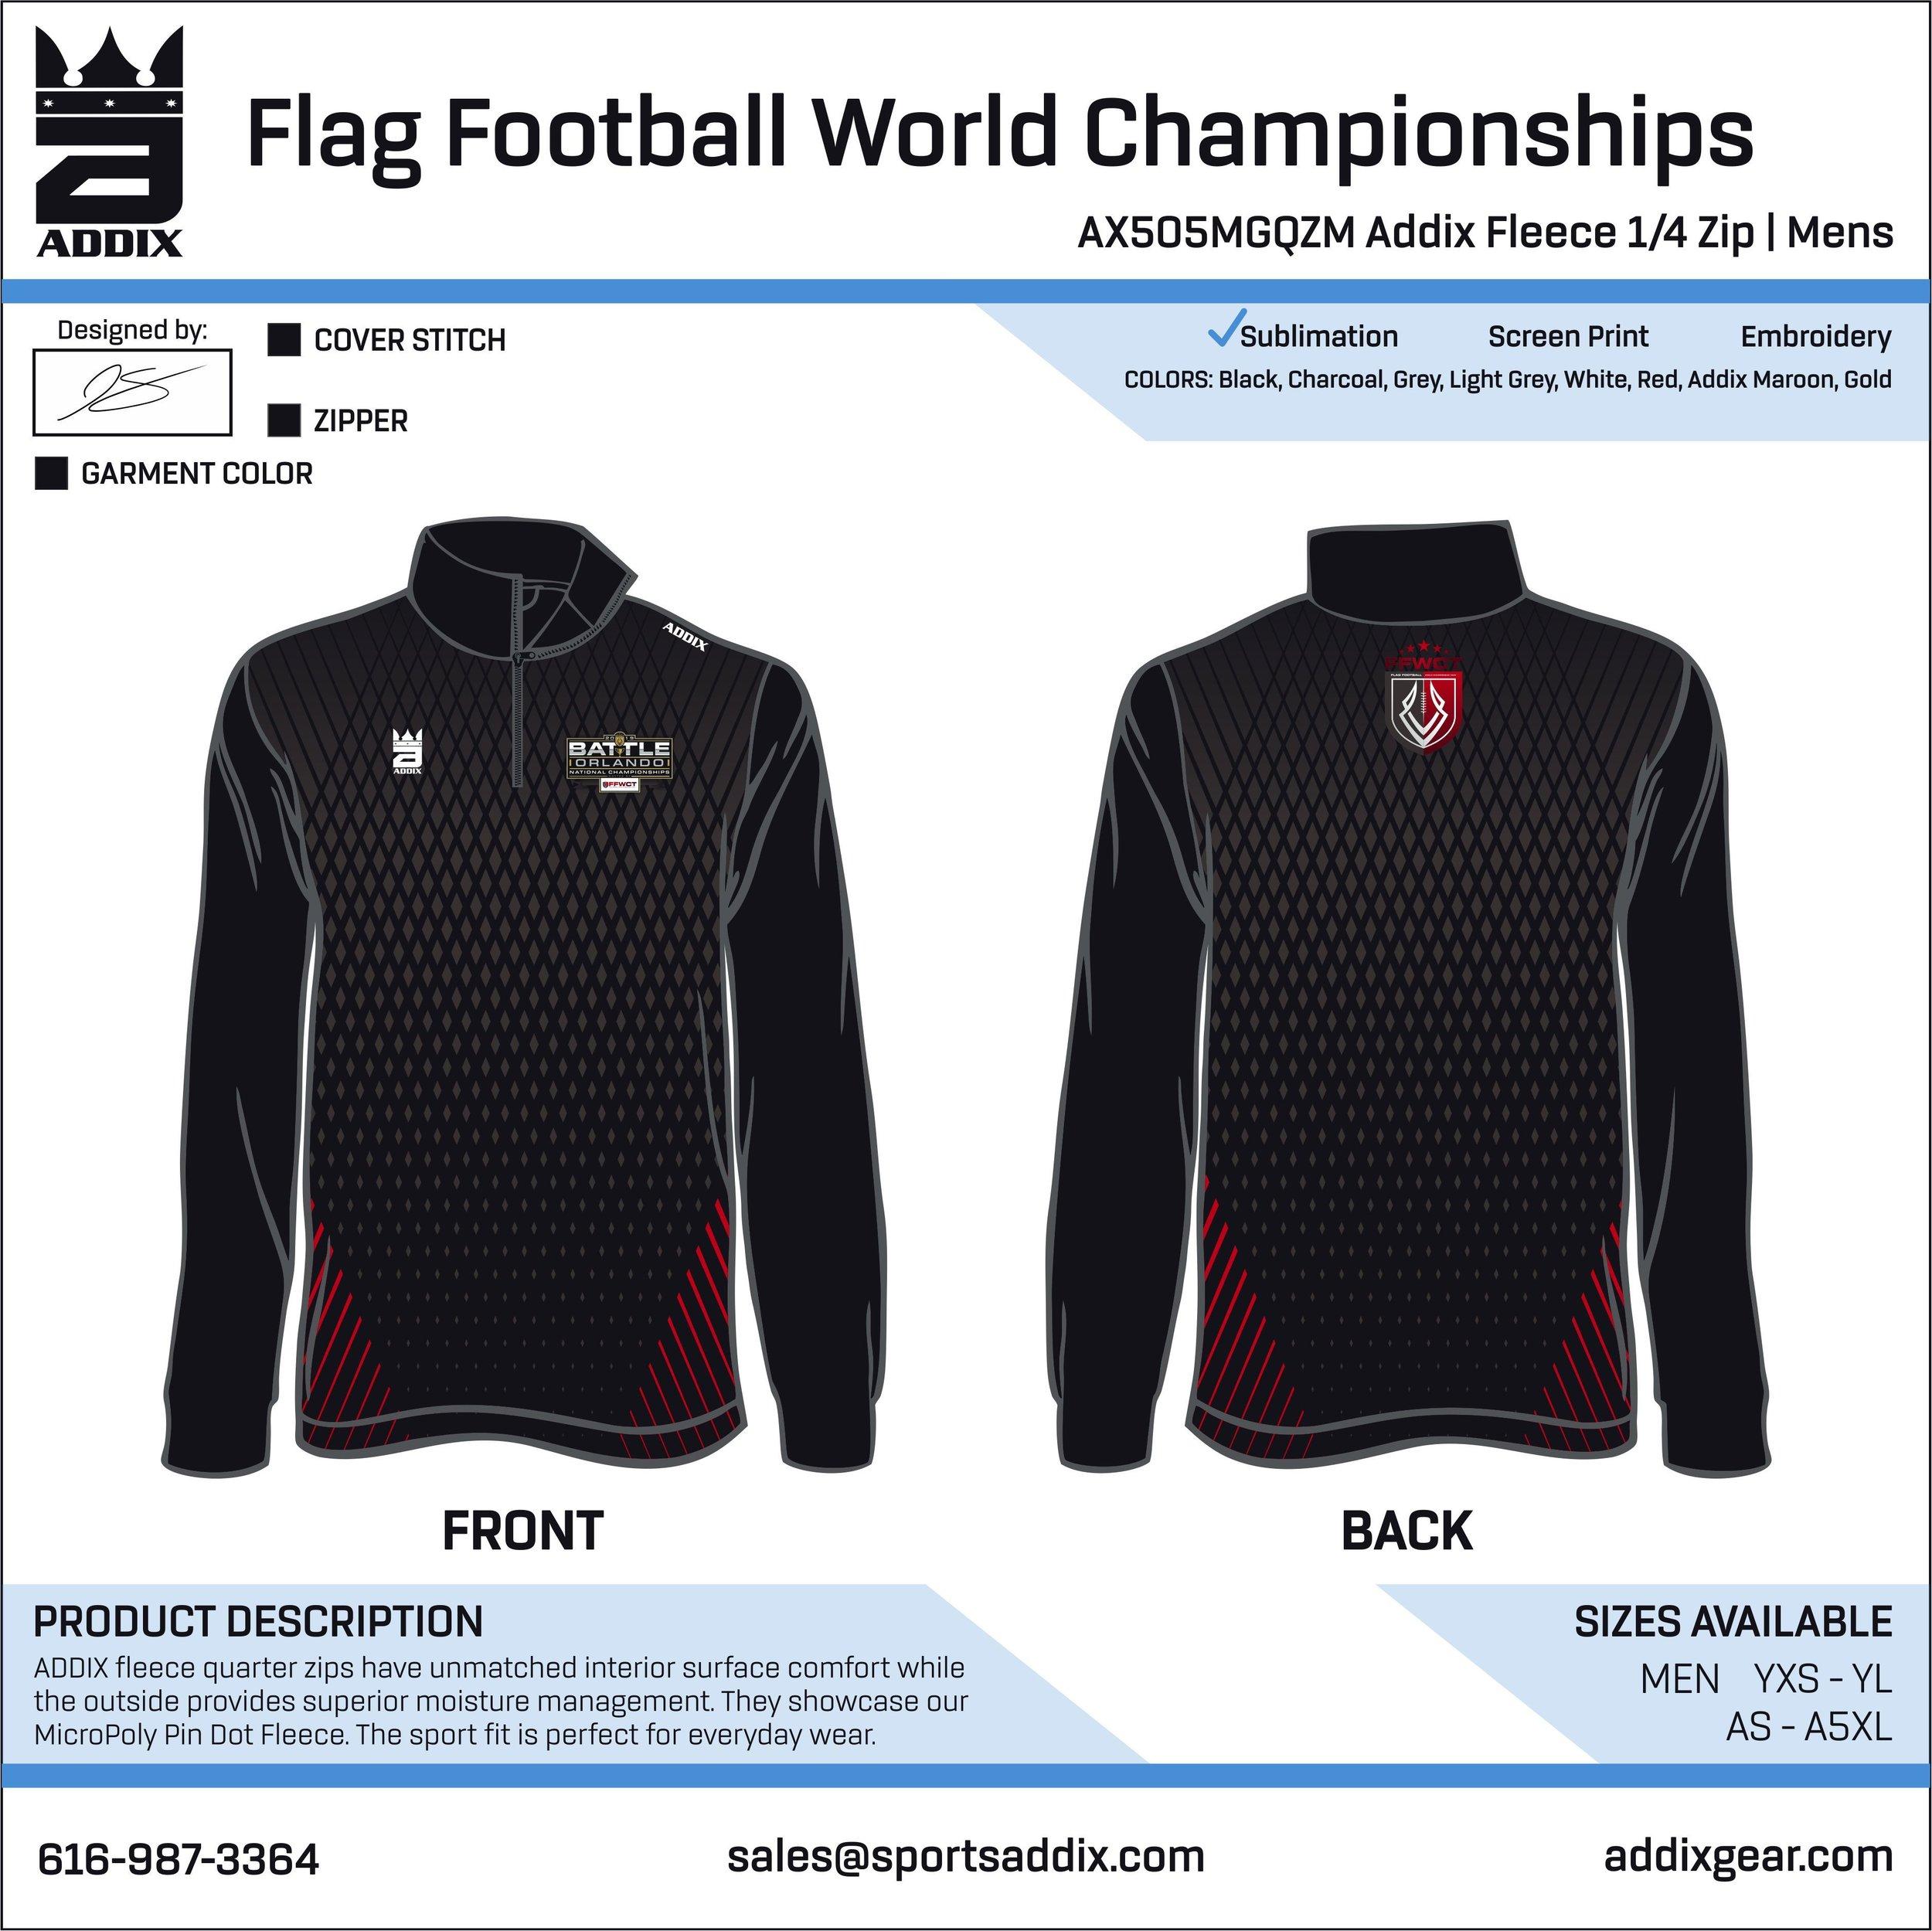 Flag Football World Championships_2018_12-26_JE_QZ Full Sub.jpg